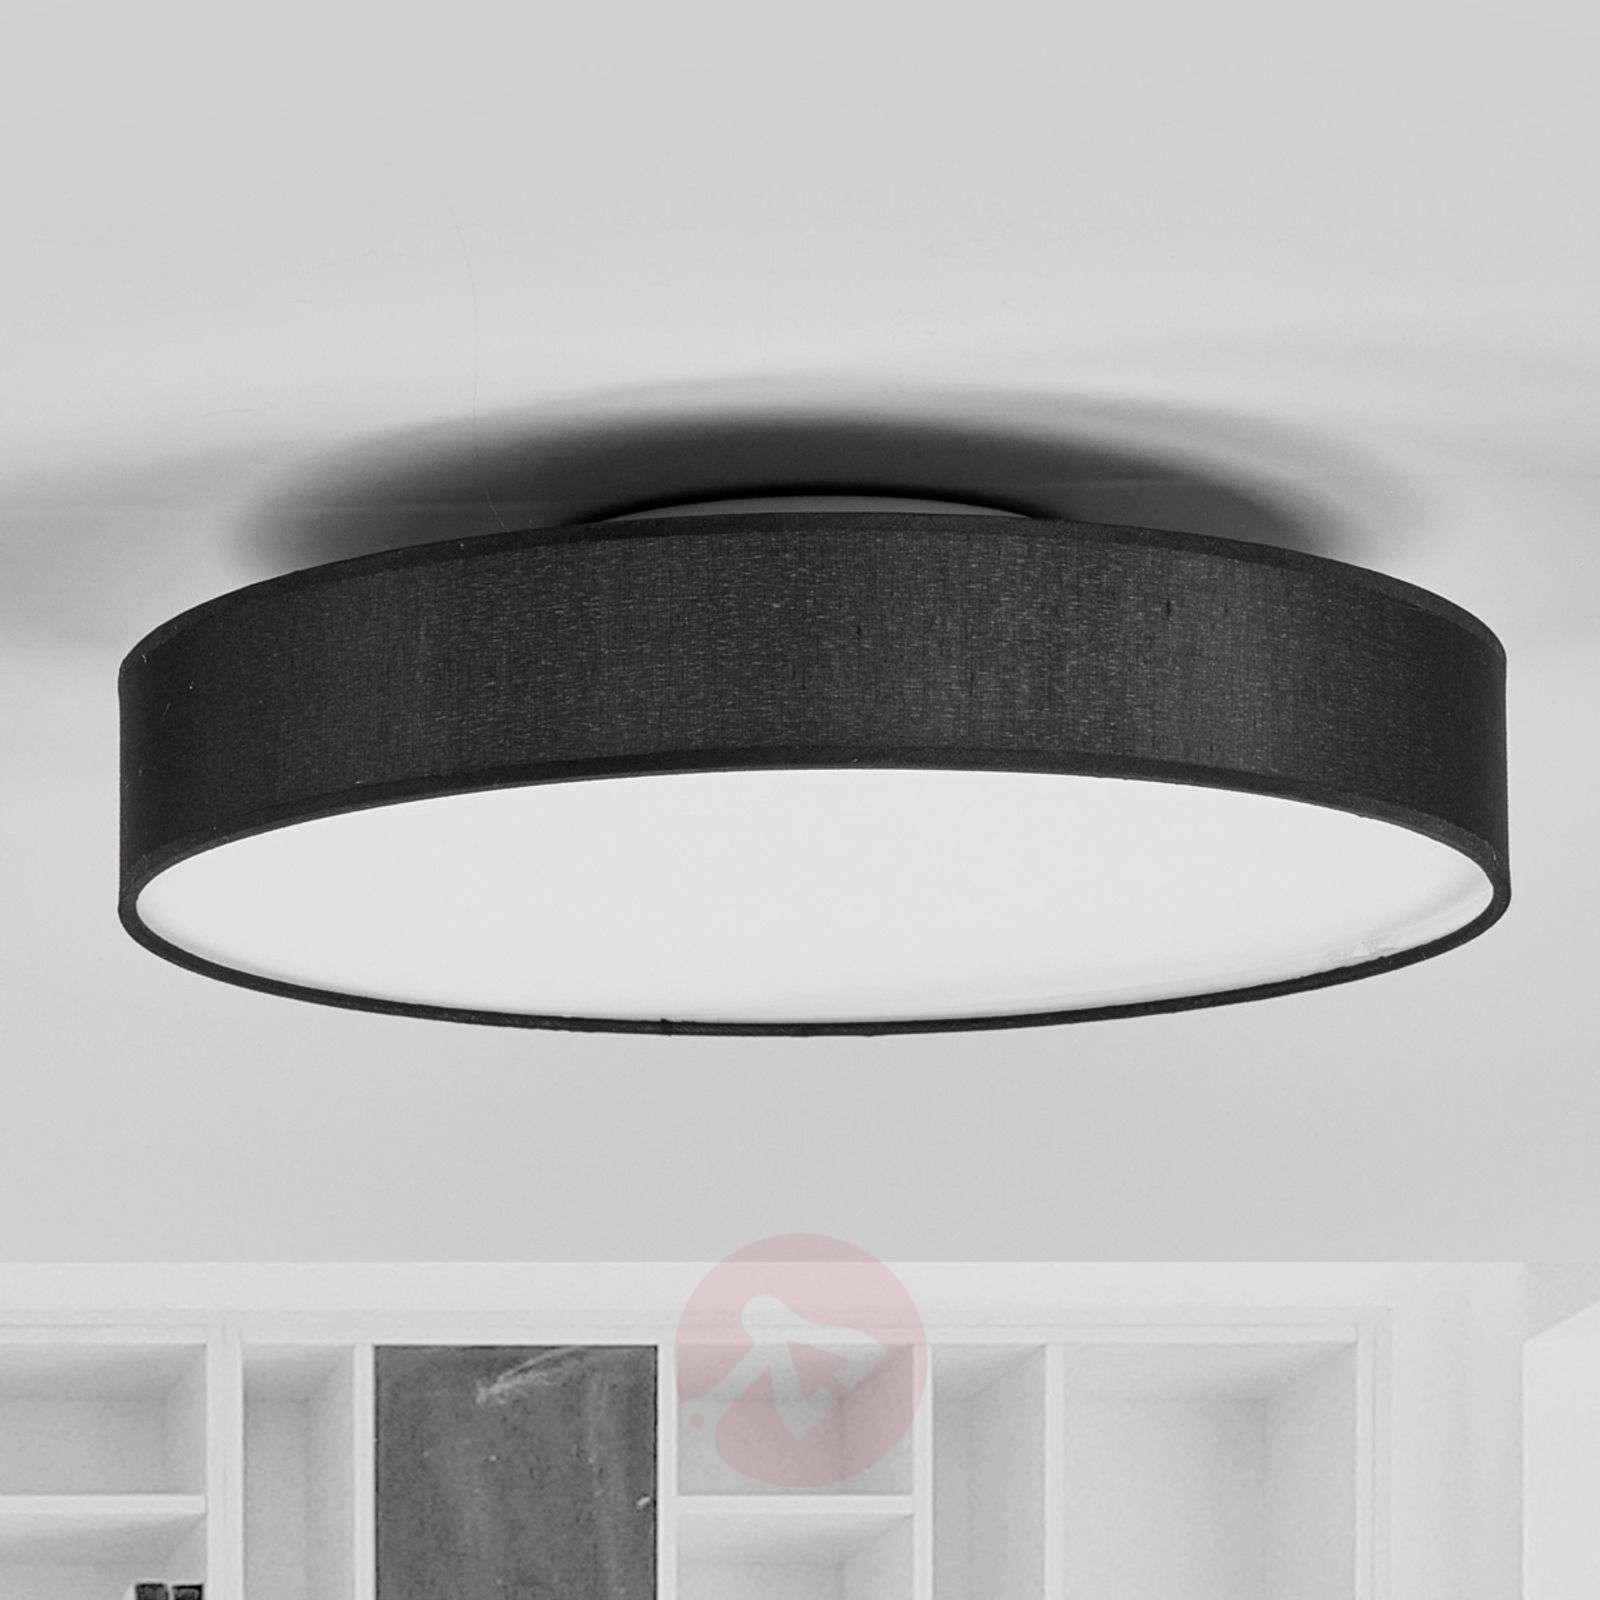 Round led fabric ceiling lamp saira in black lights round led fabric ceiling lamp saira in black 9625090 02 aloadofball Choice Image